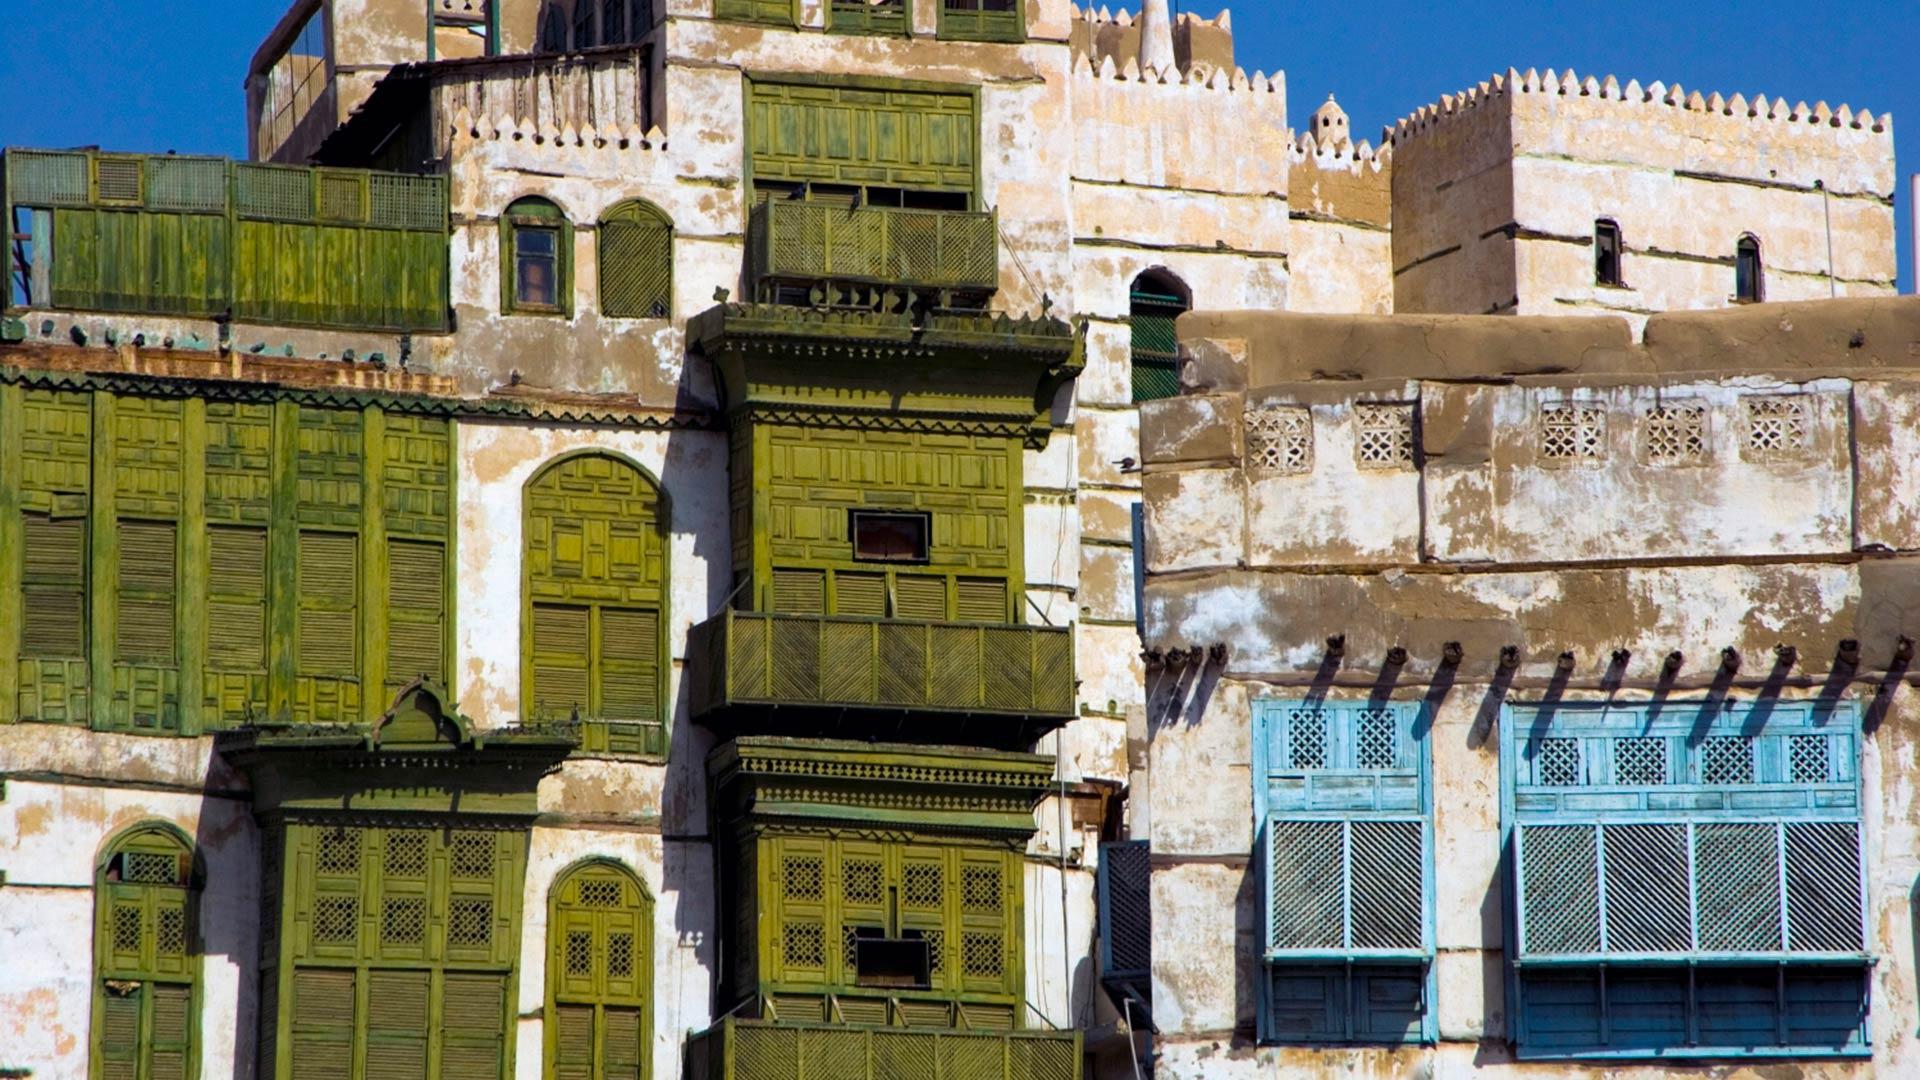 Traditional architecture in Jeddah, Saudi Arabia